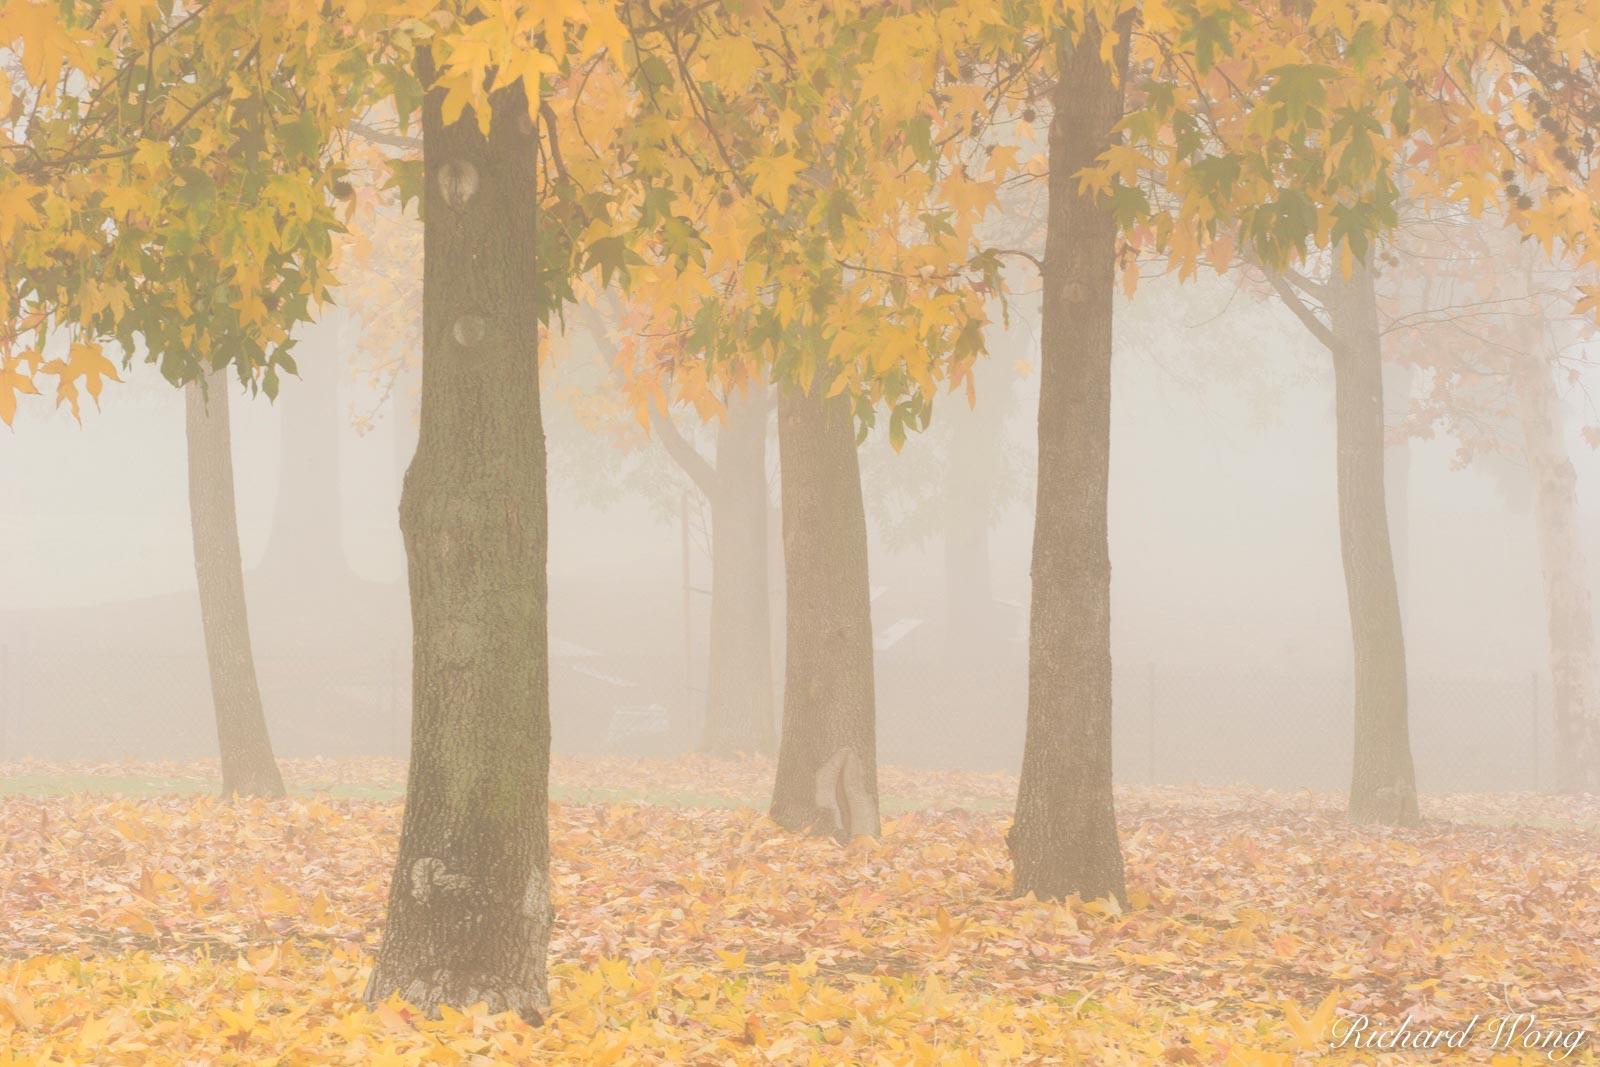 Liquid Amber Fall Colors in Fog at Gladstone Park, Glendora, California, photo, photo